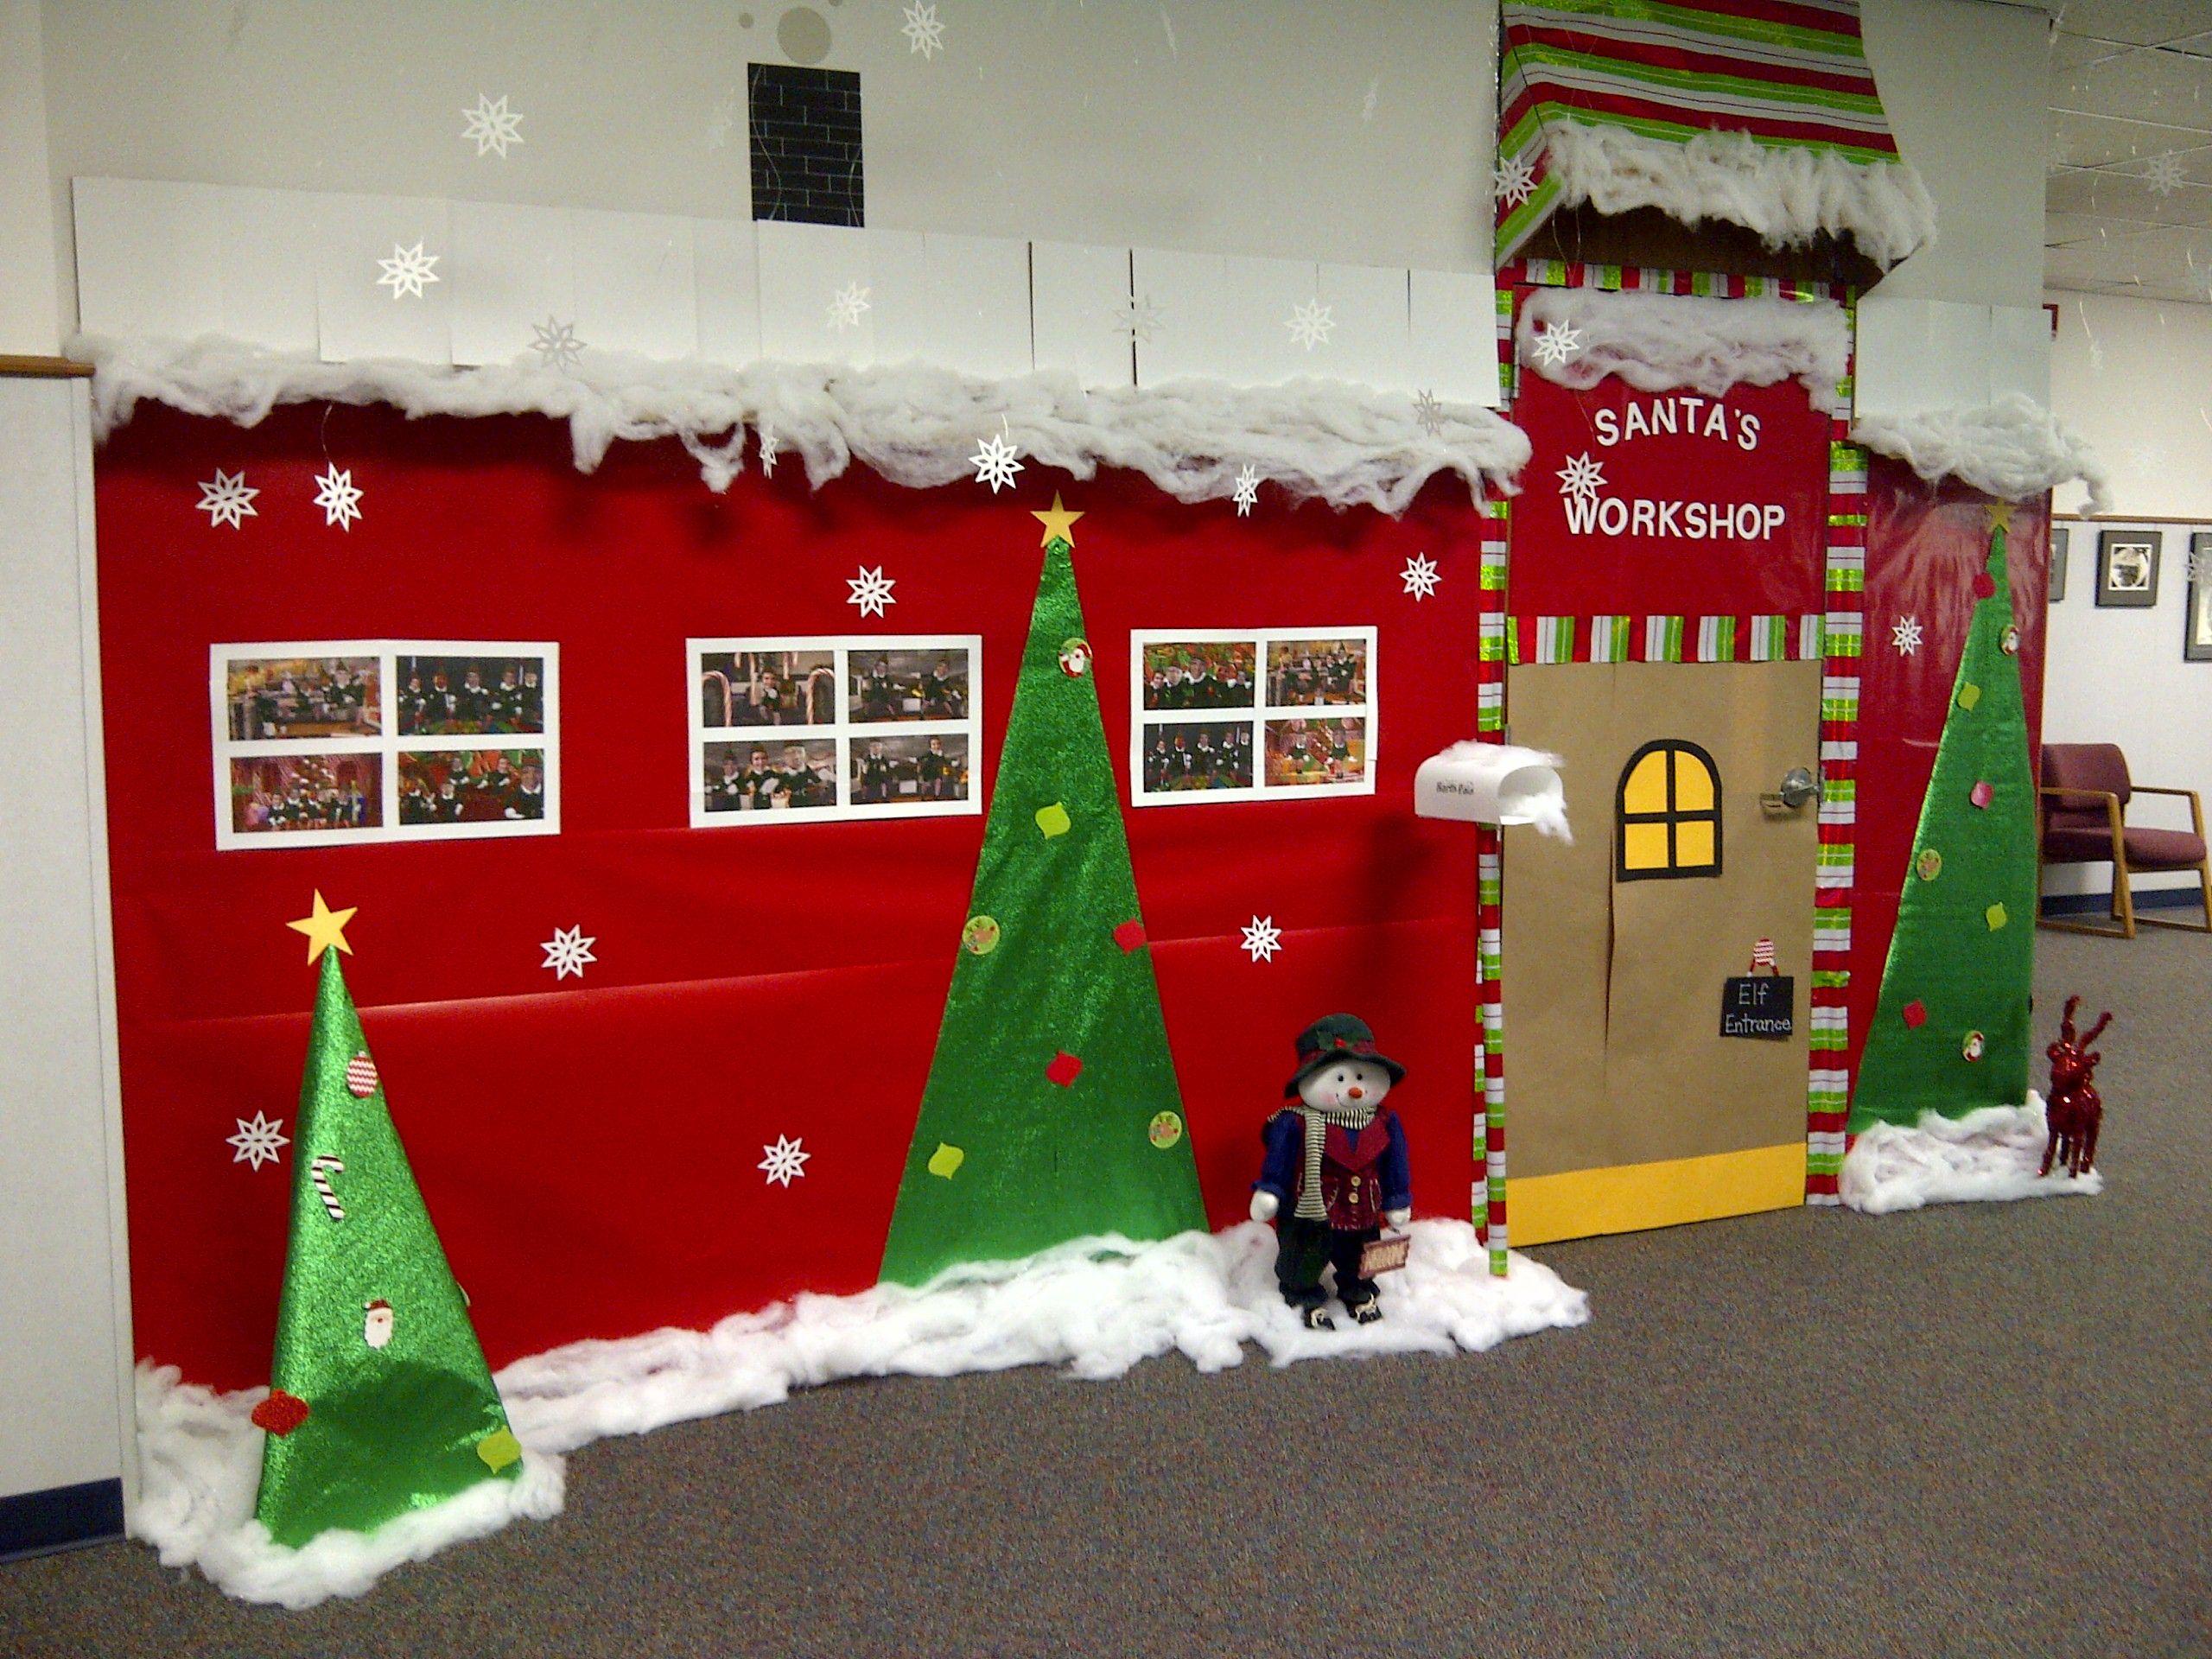 Santa's Workshop door decorations or rather wall ...